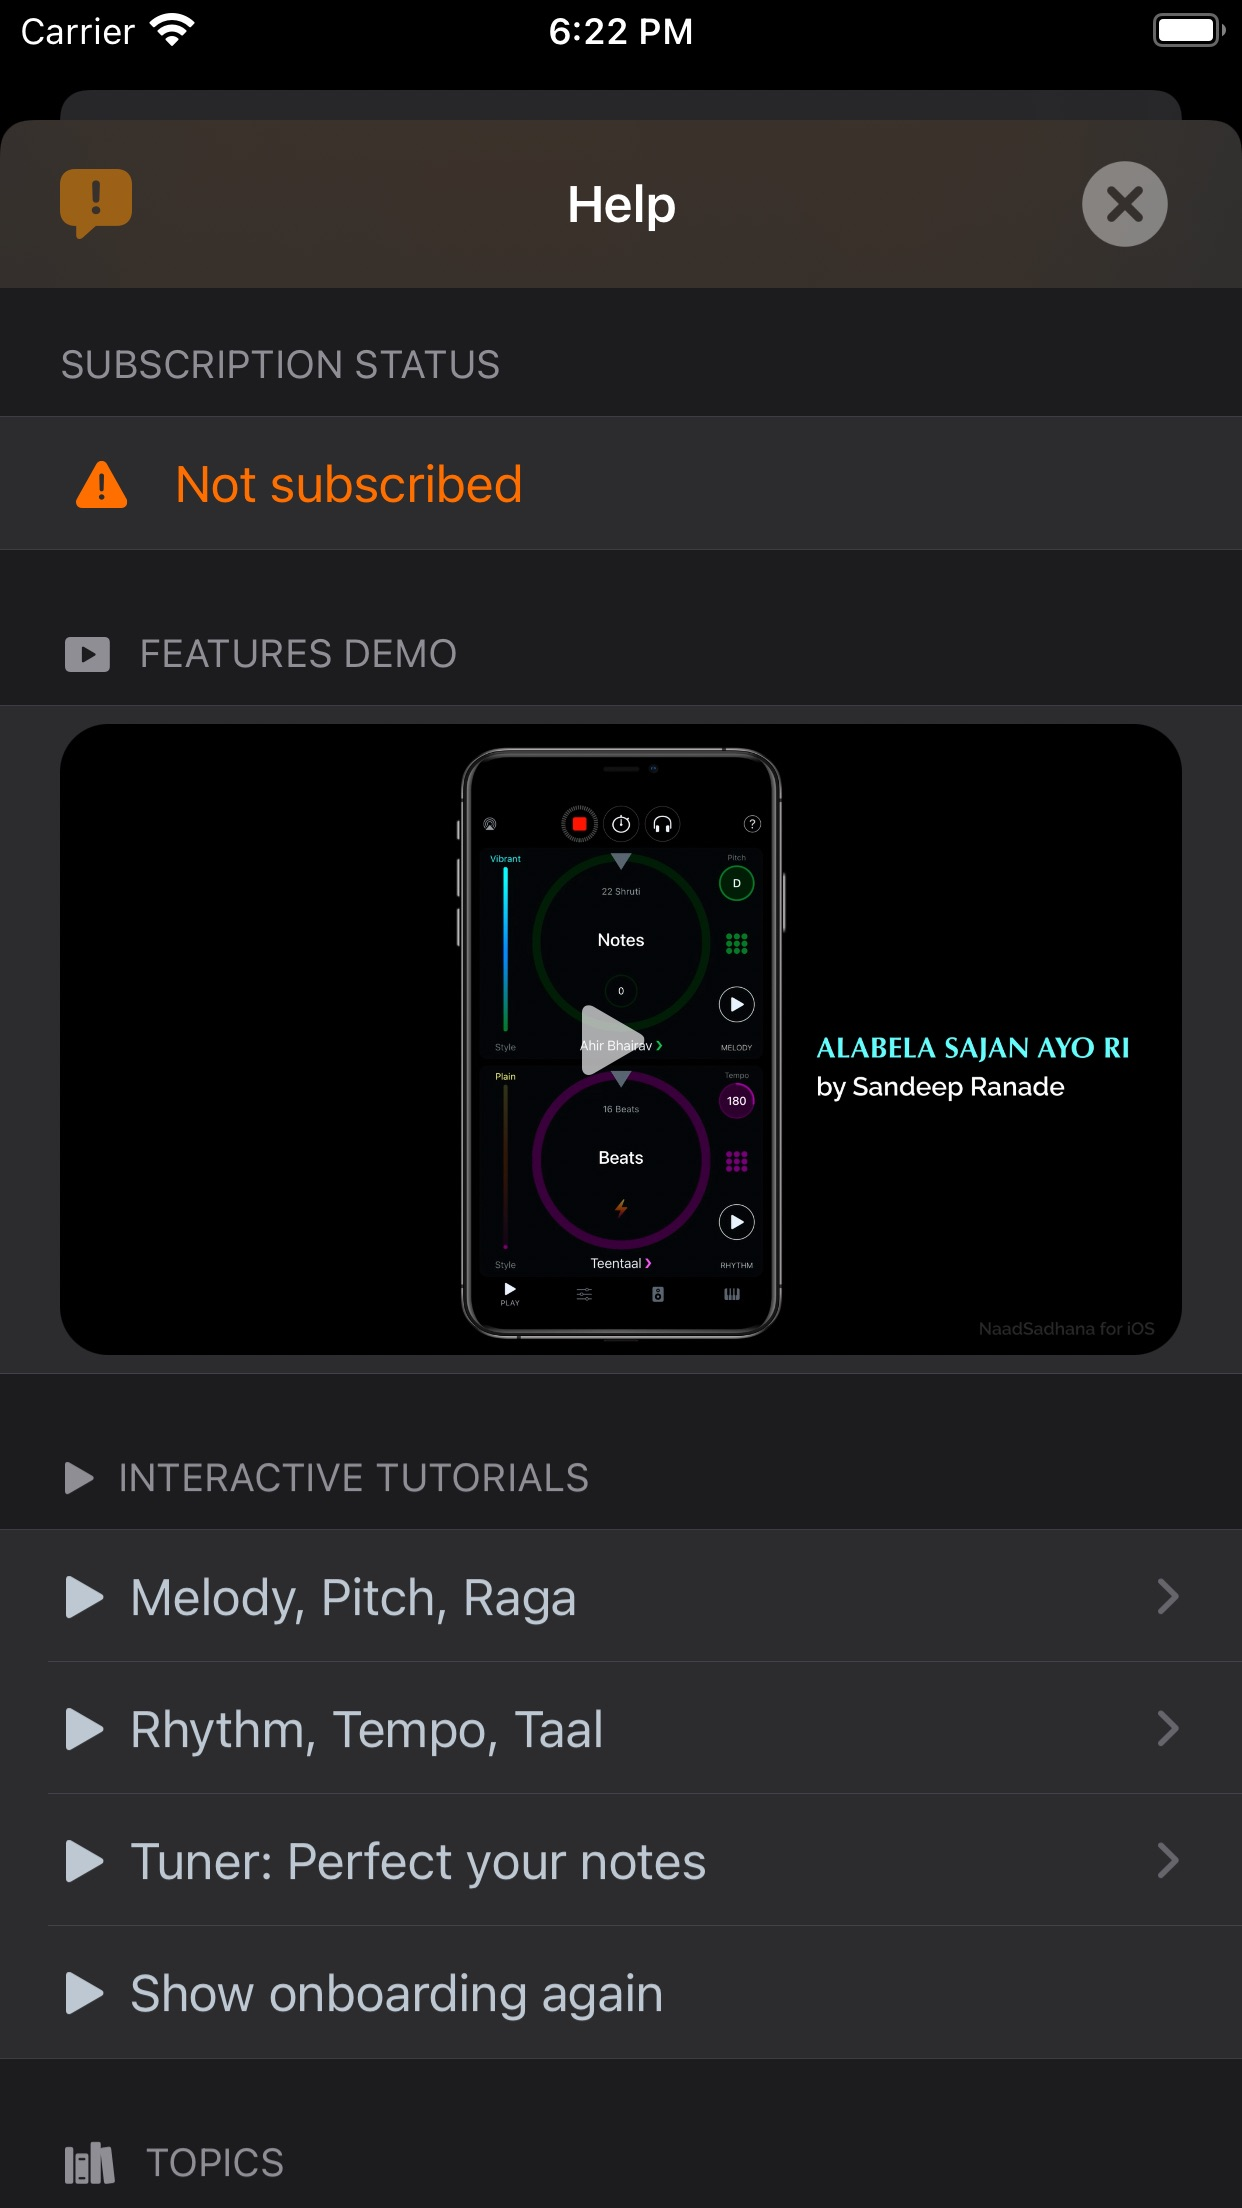 Screenshot do app NaadSadhana